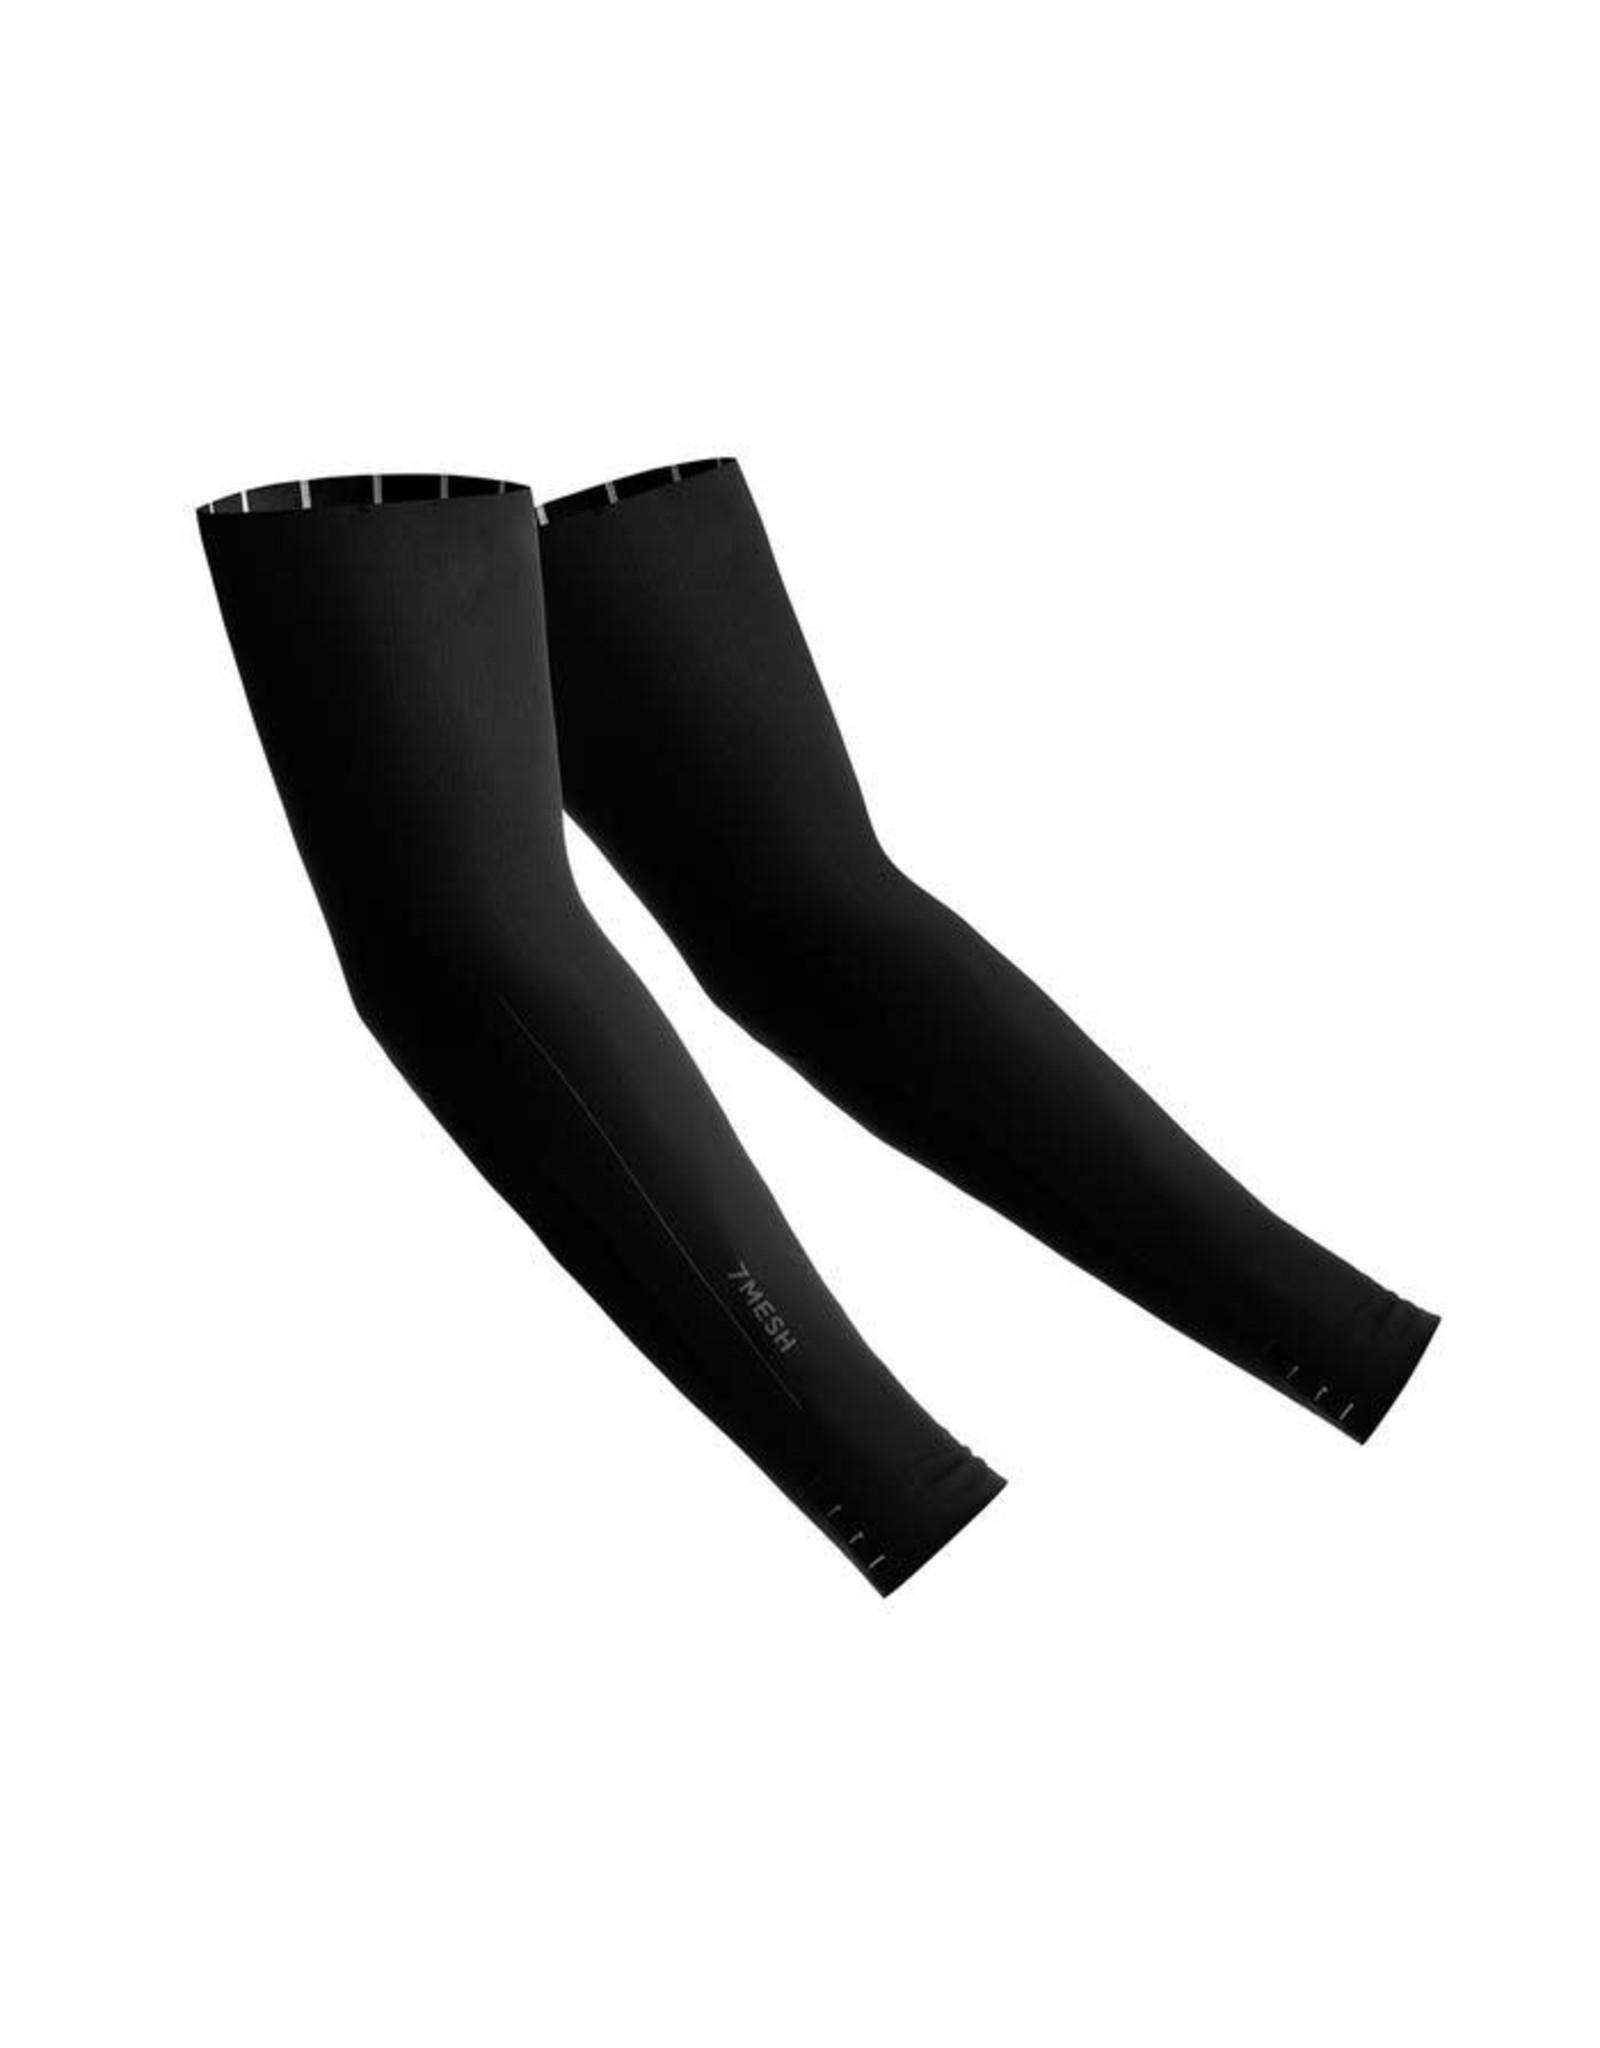 7MESH 7MESH - Colorado Arm Warmer Black Lrg